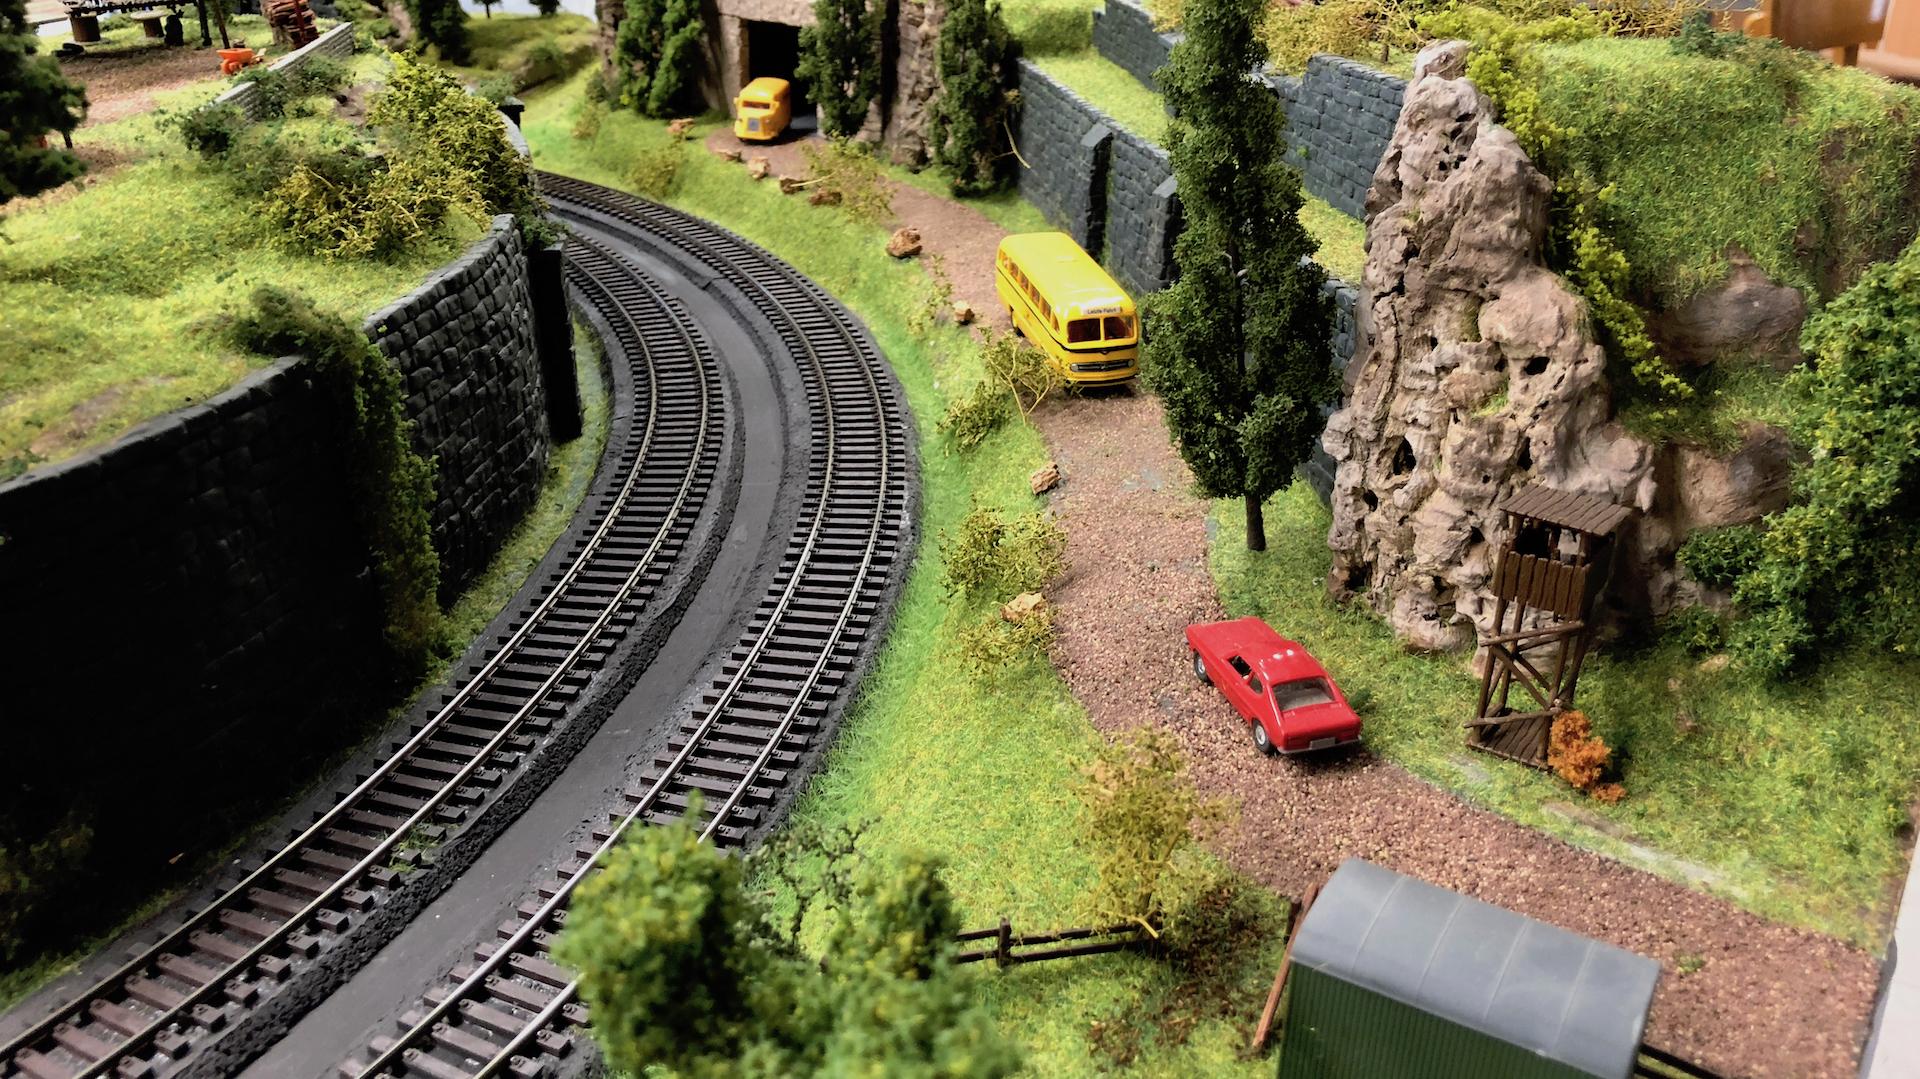 18_02_24_Schautag-Eisenbahnfreunde-Hameln_026